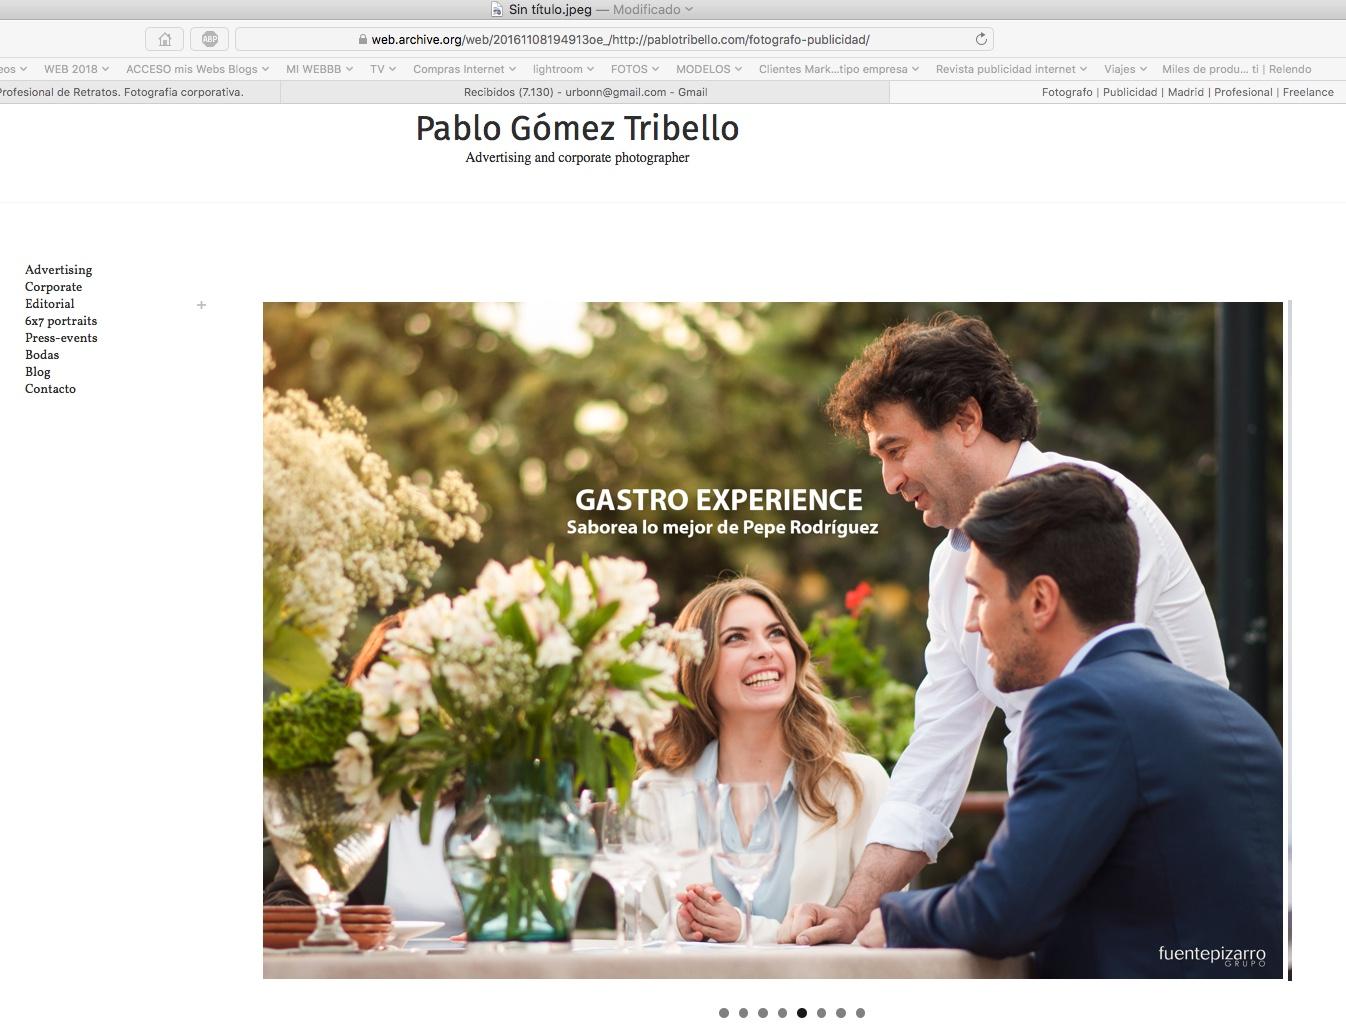 pablo-tribello-fotografo-se-apropia-de-clientes-nachourbon